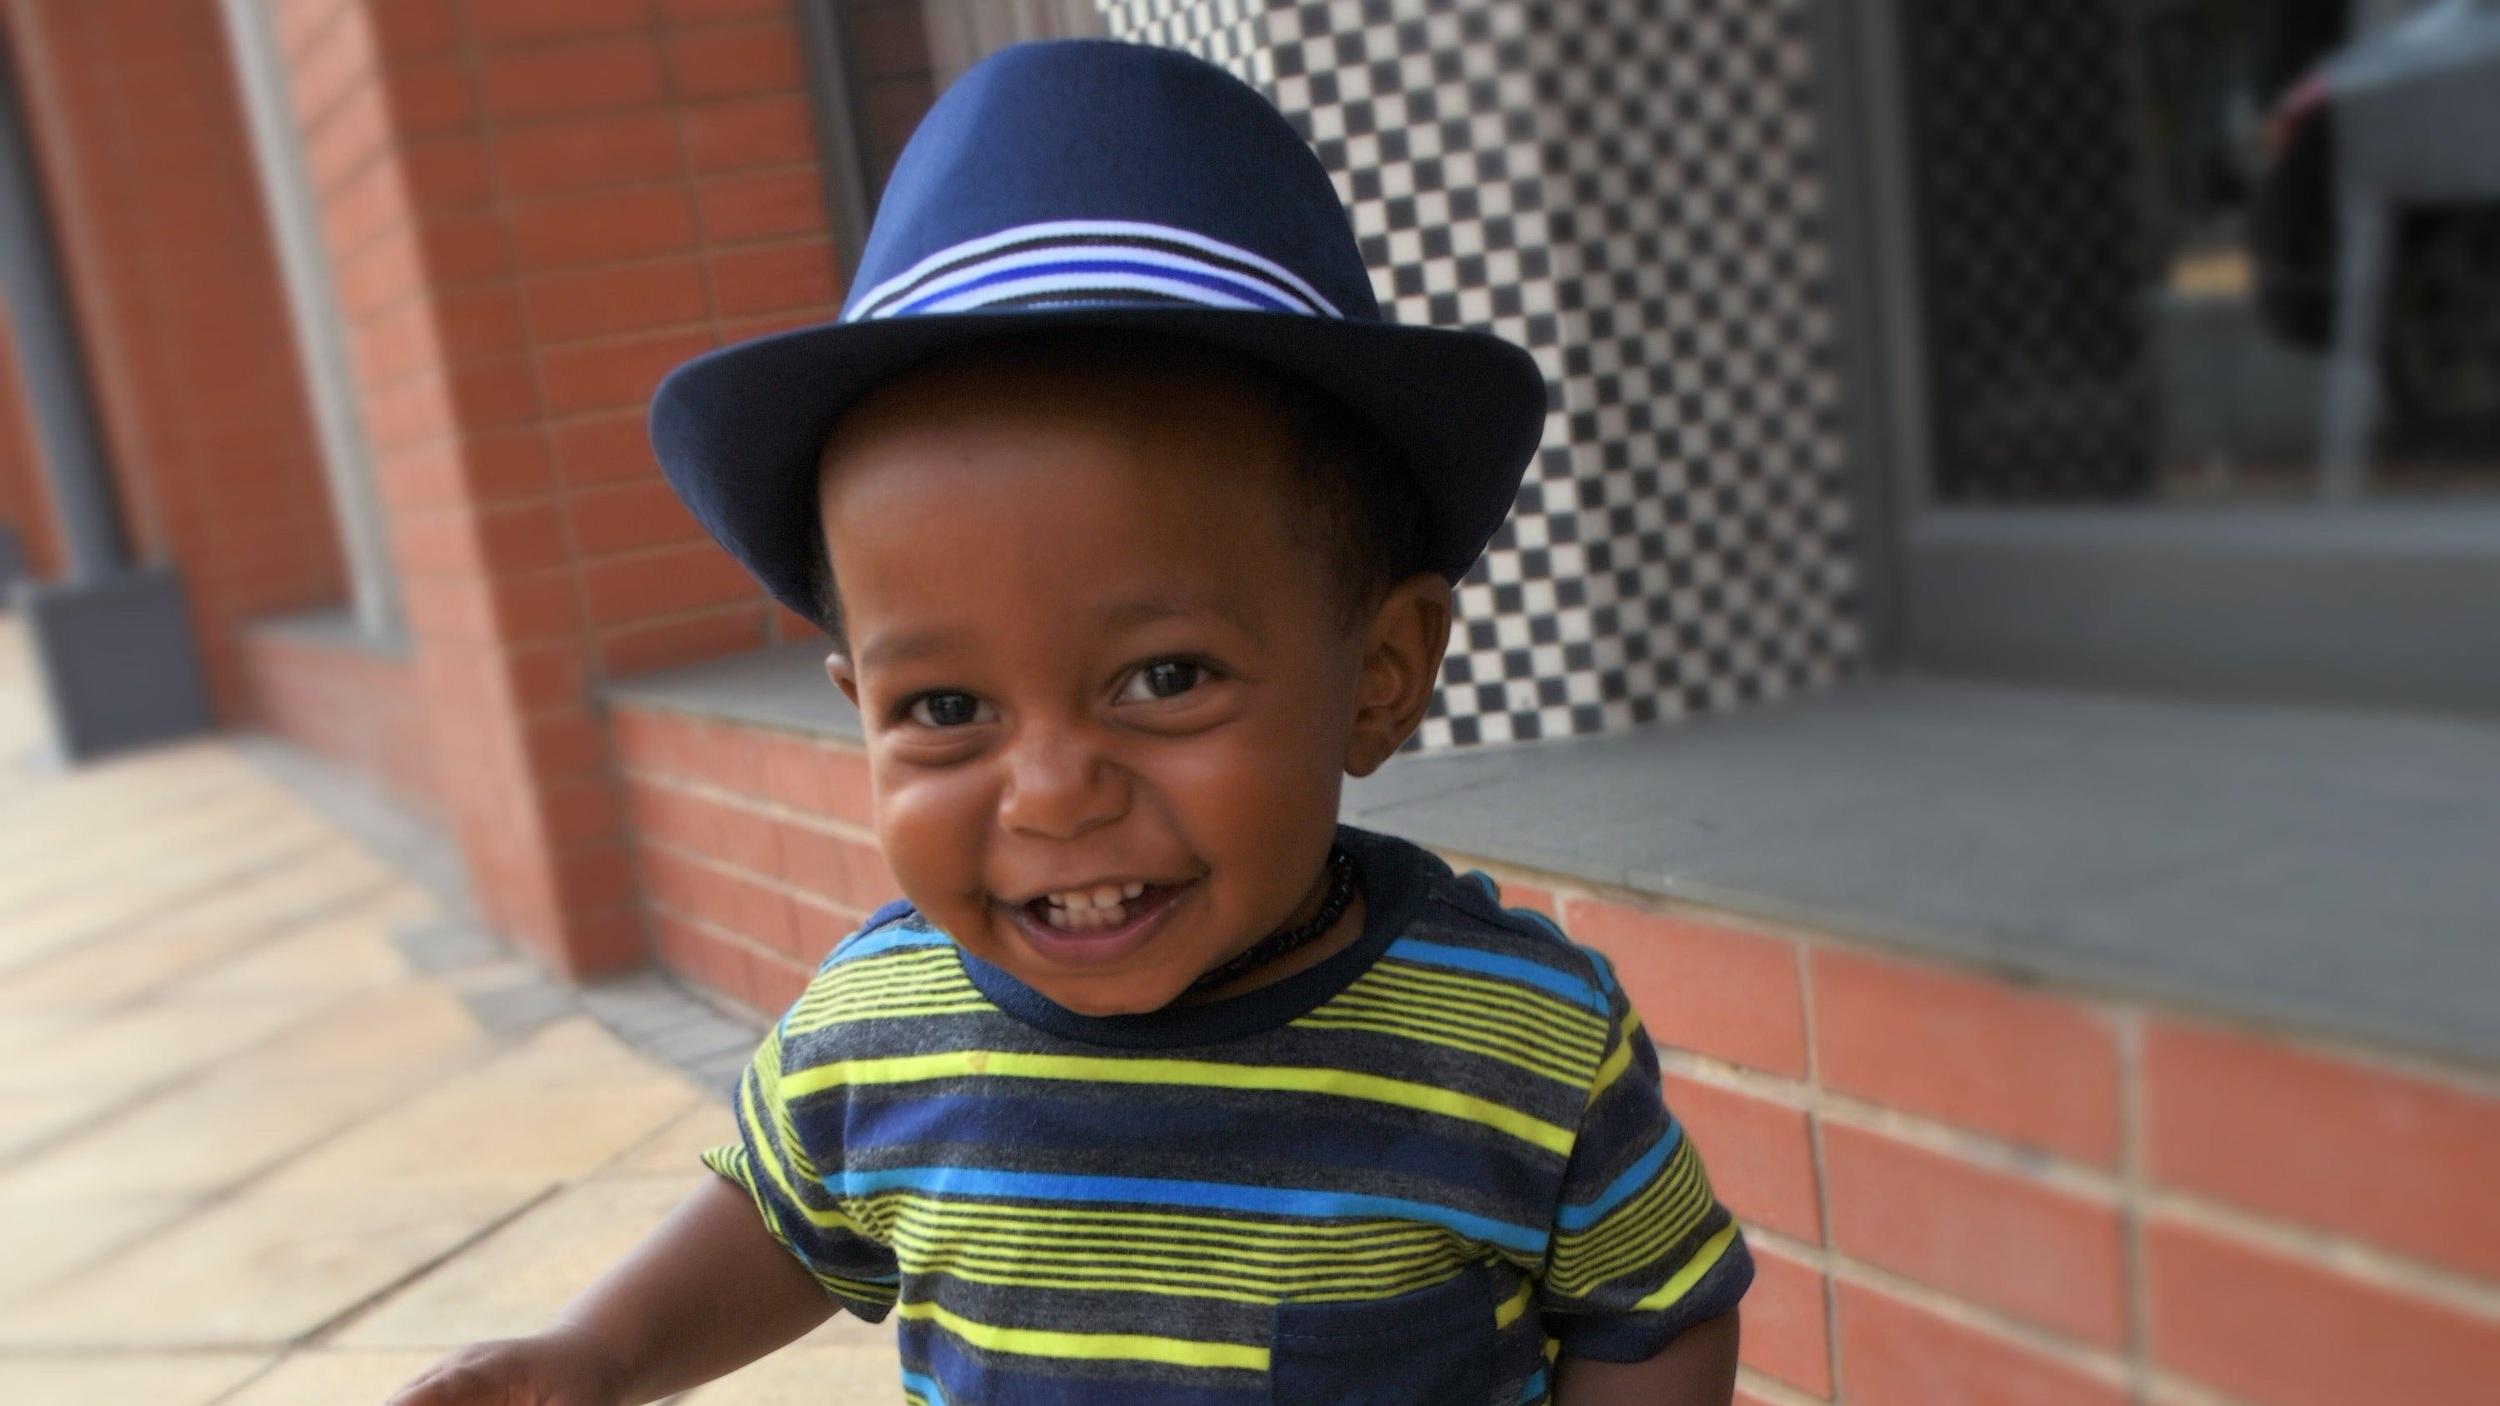 adorable-boy-child-1701097.jpg